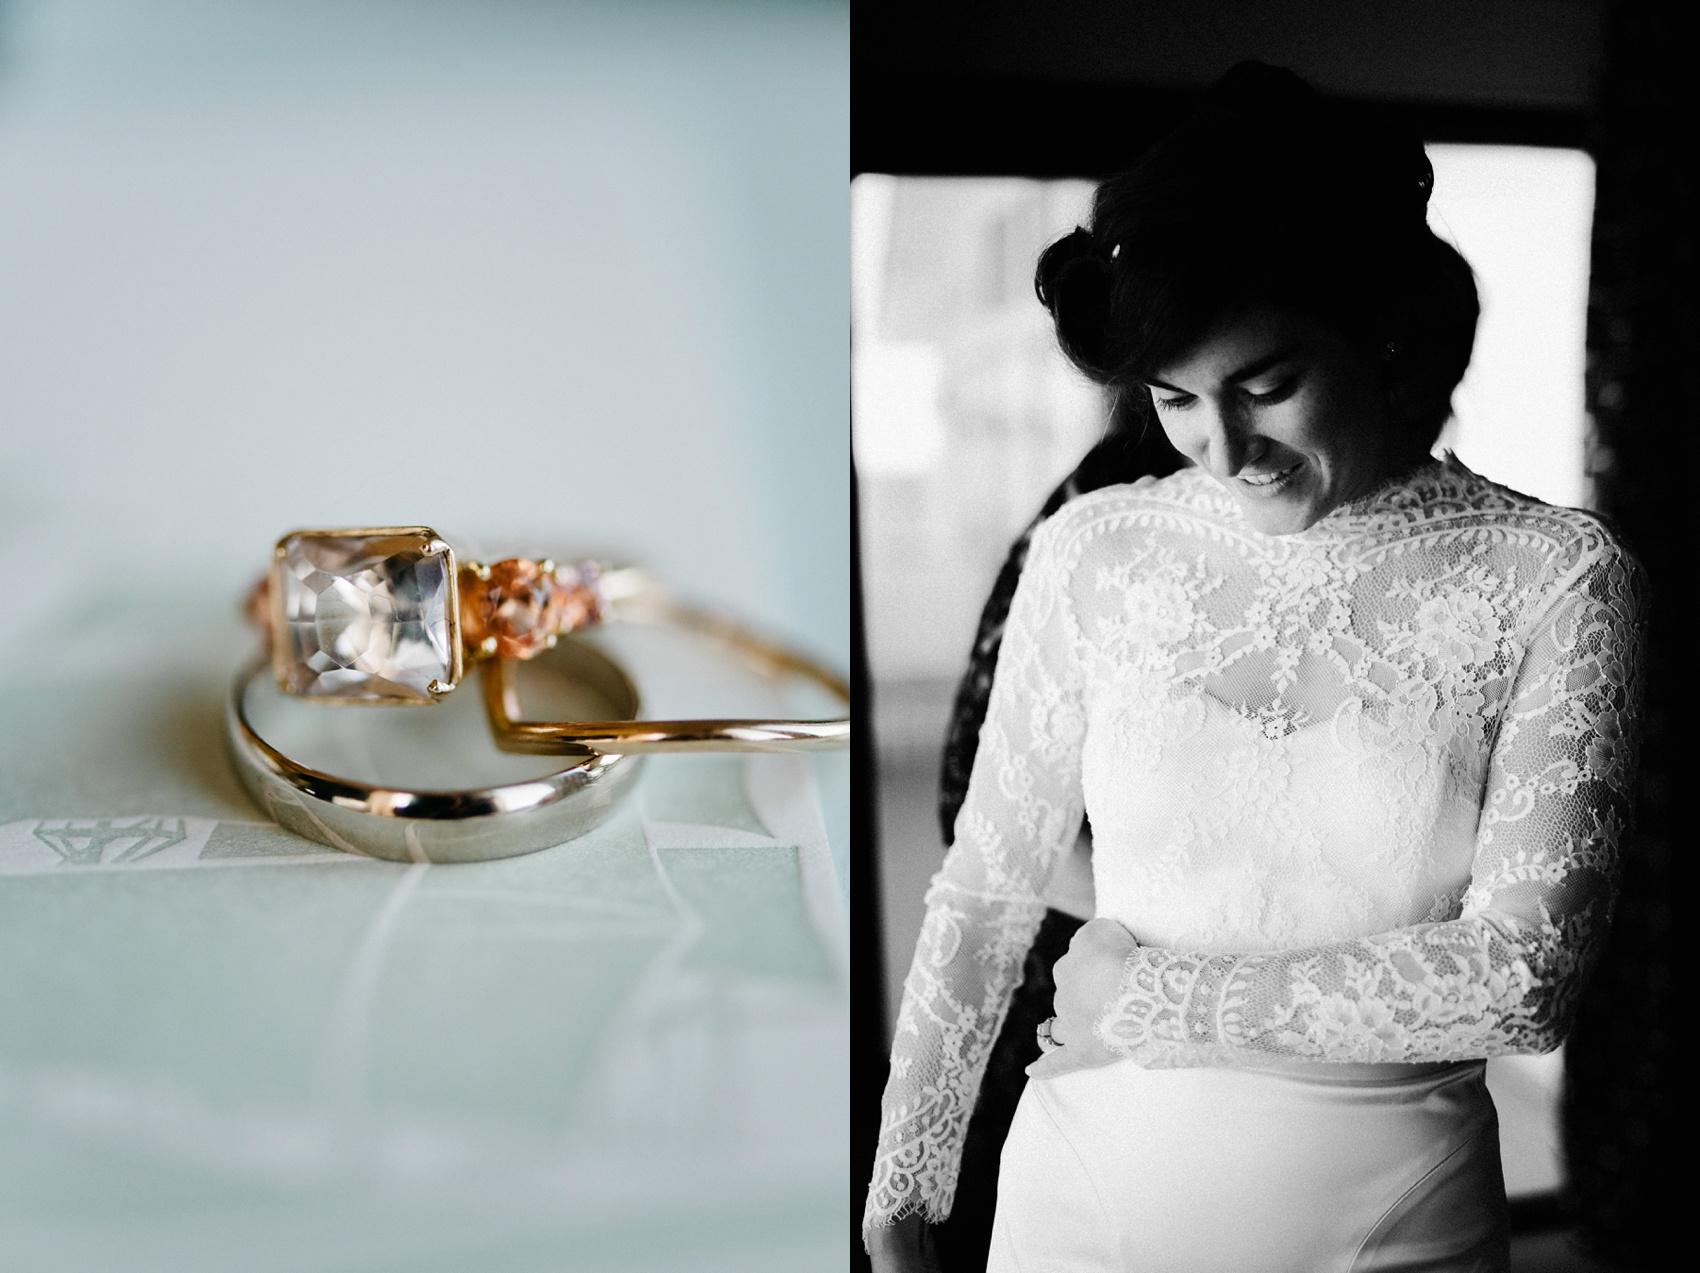 outerbanks_wedding_photographer_1251.jpg